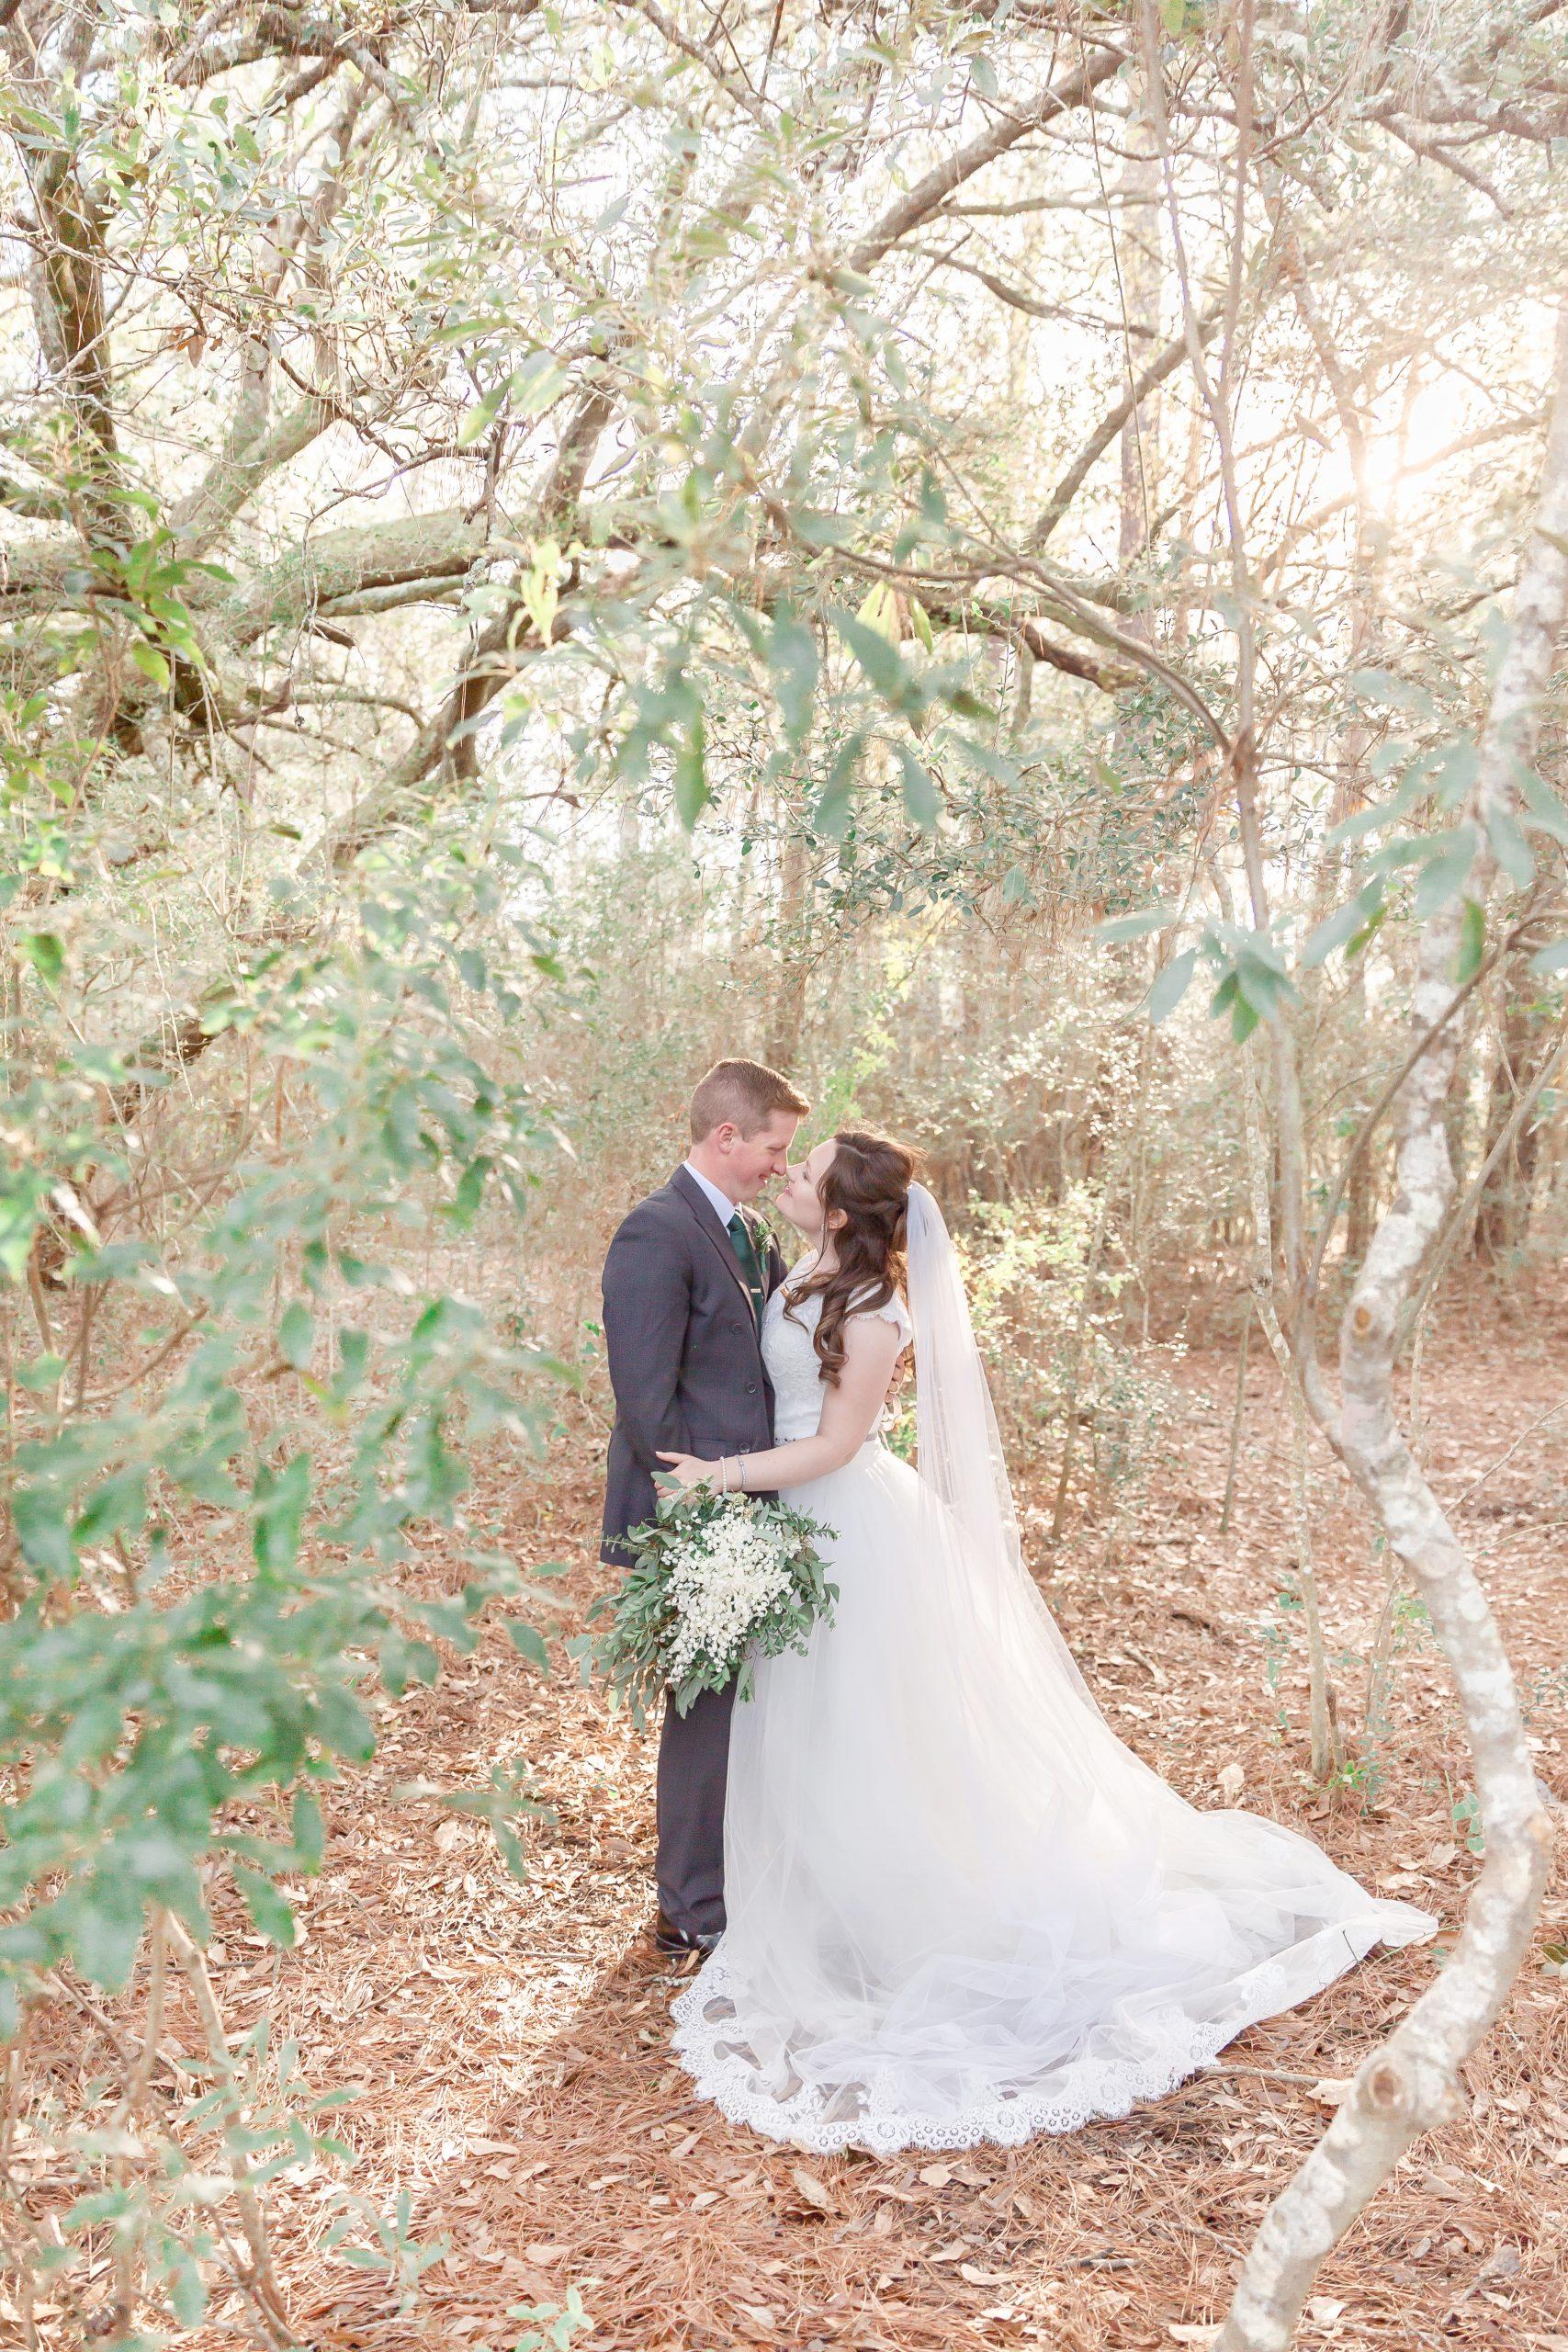 Hannah + Daniel Wedding | Ocean Springs, Mississippi